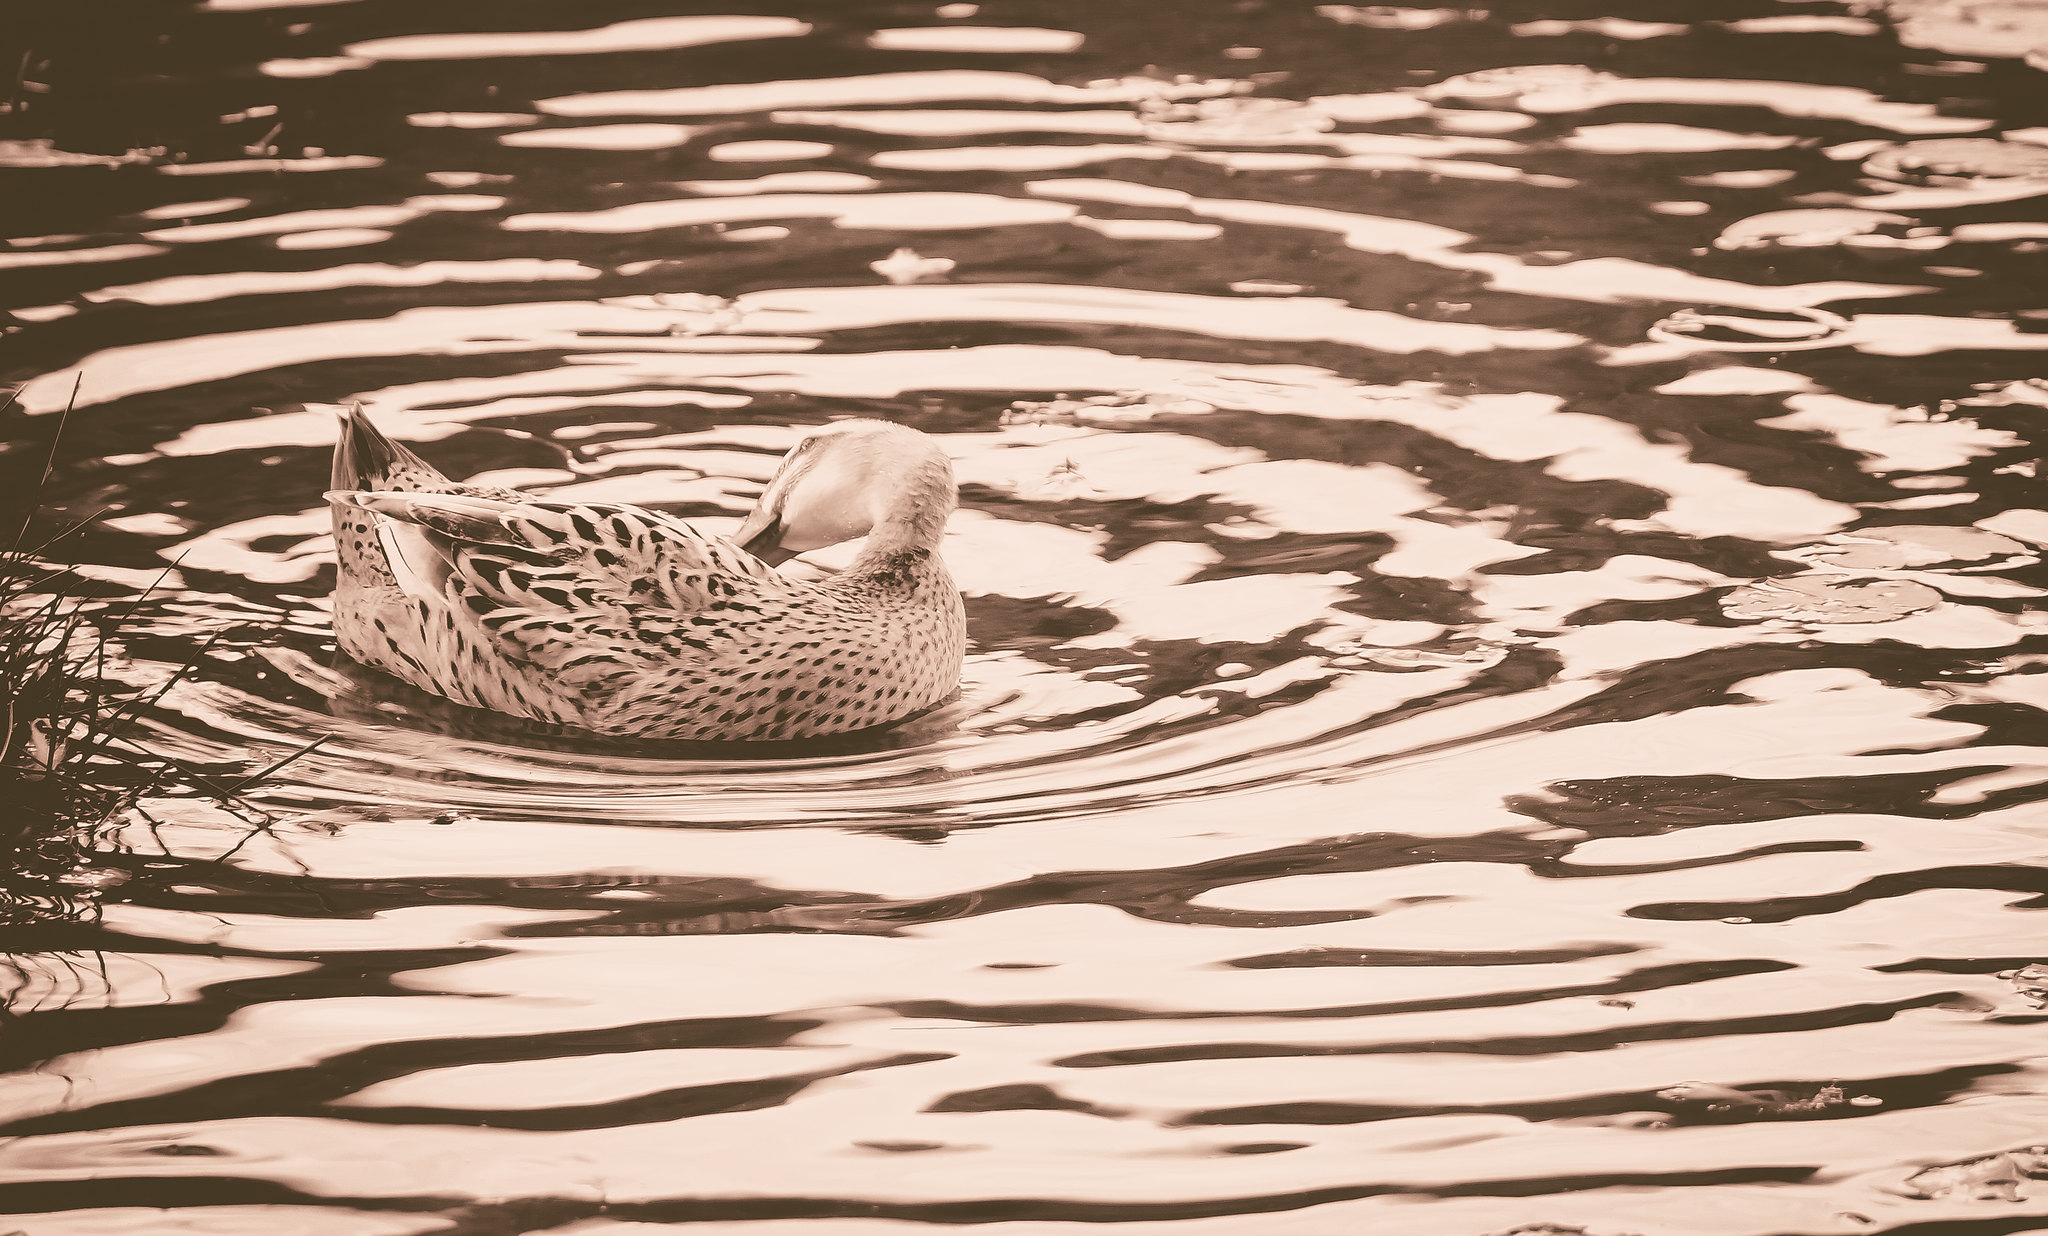 creating ripples